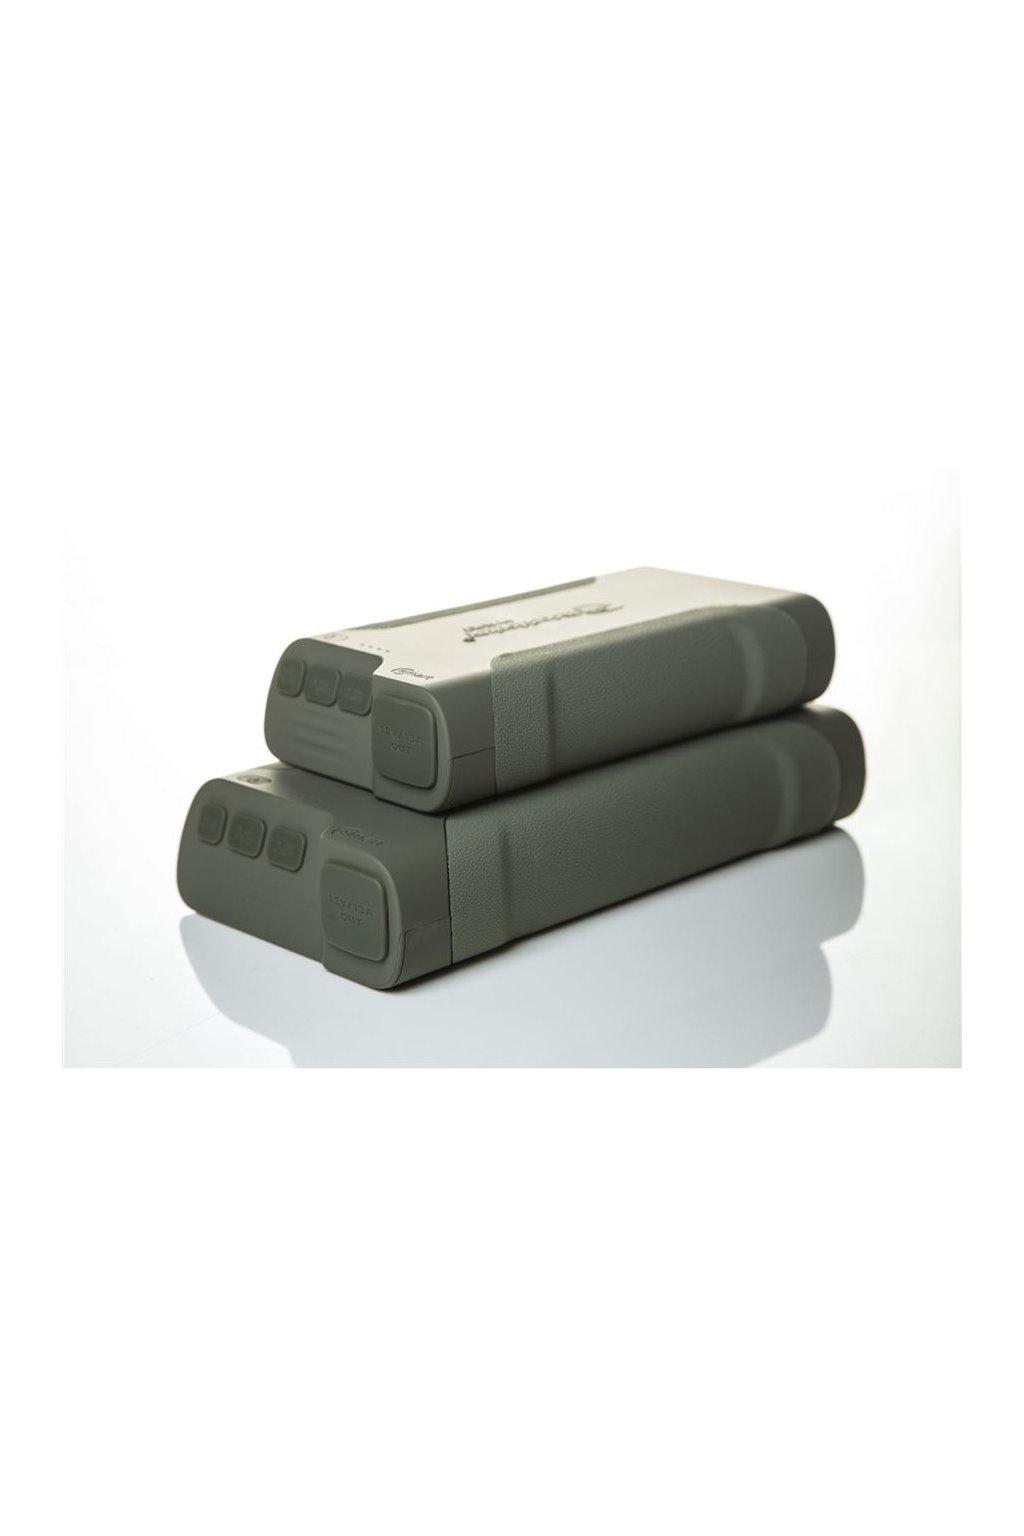 RidgeMonkey: Powerbanka Vault C-Smart 42150mAh Zelená